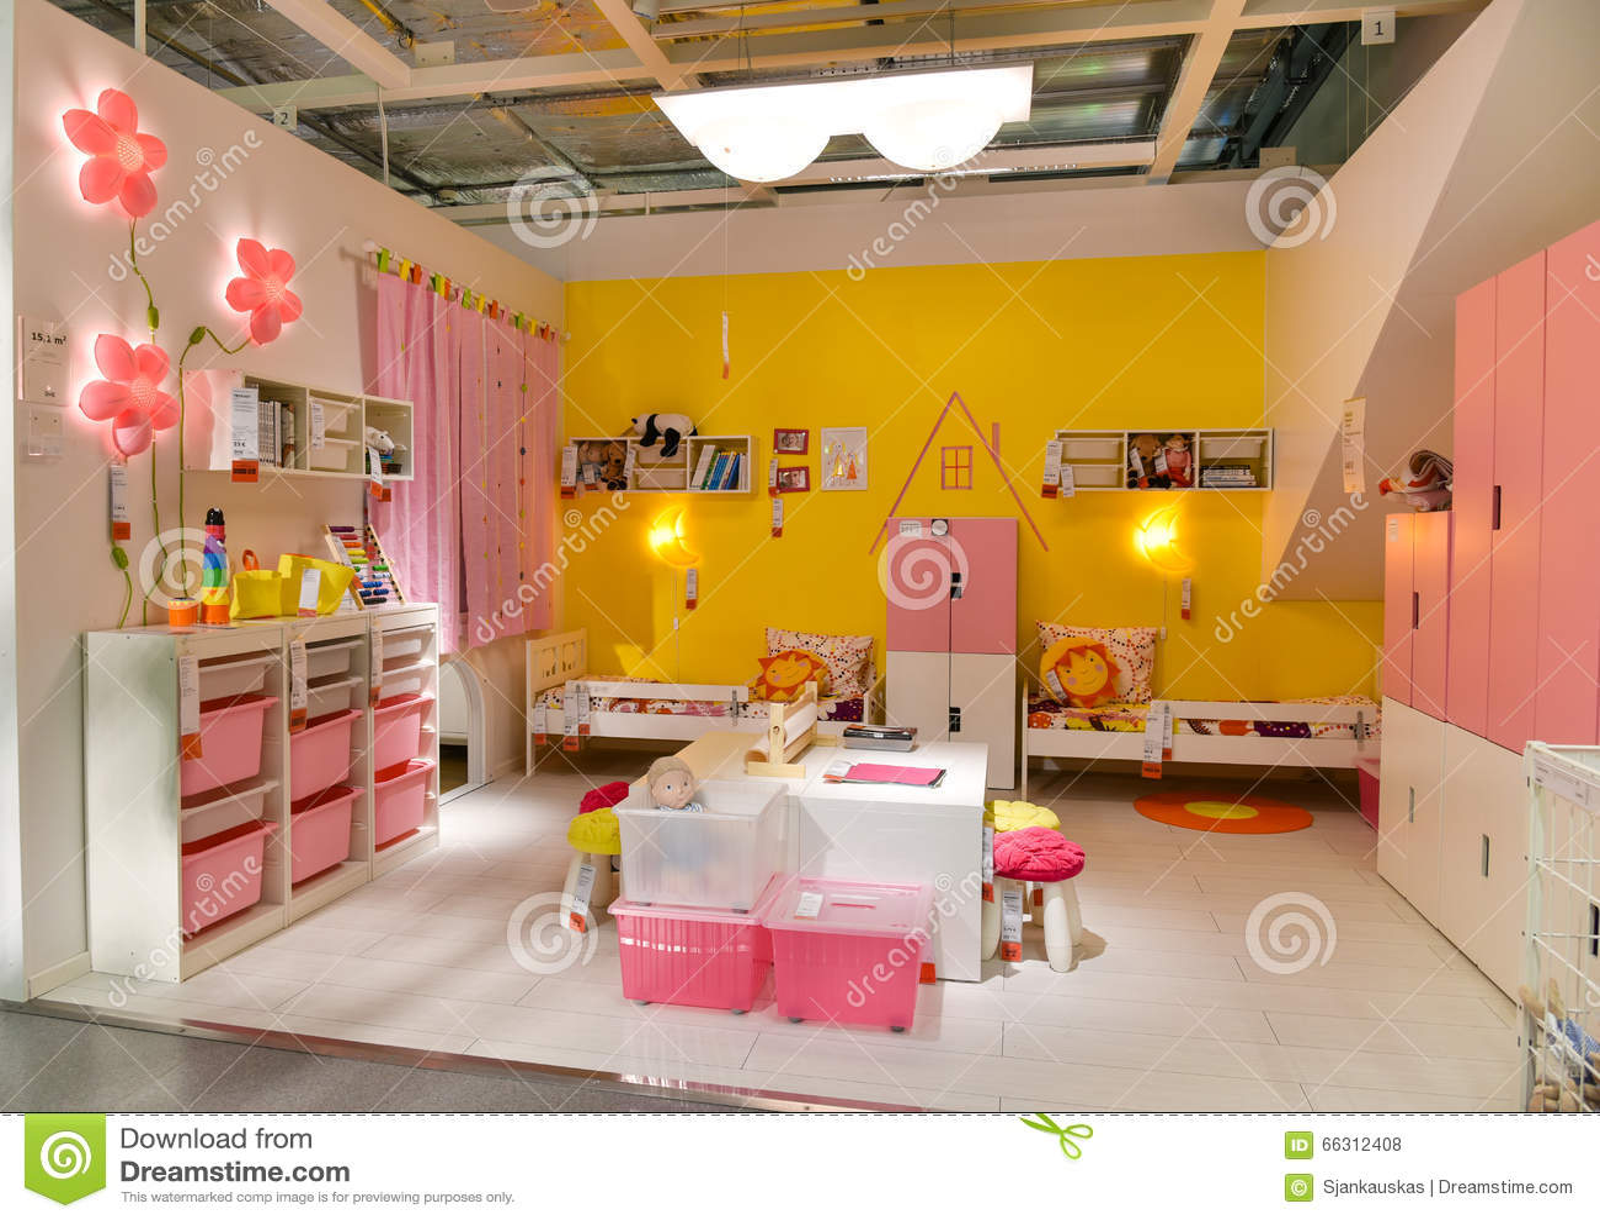 Children Room Furniture In Ikea